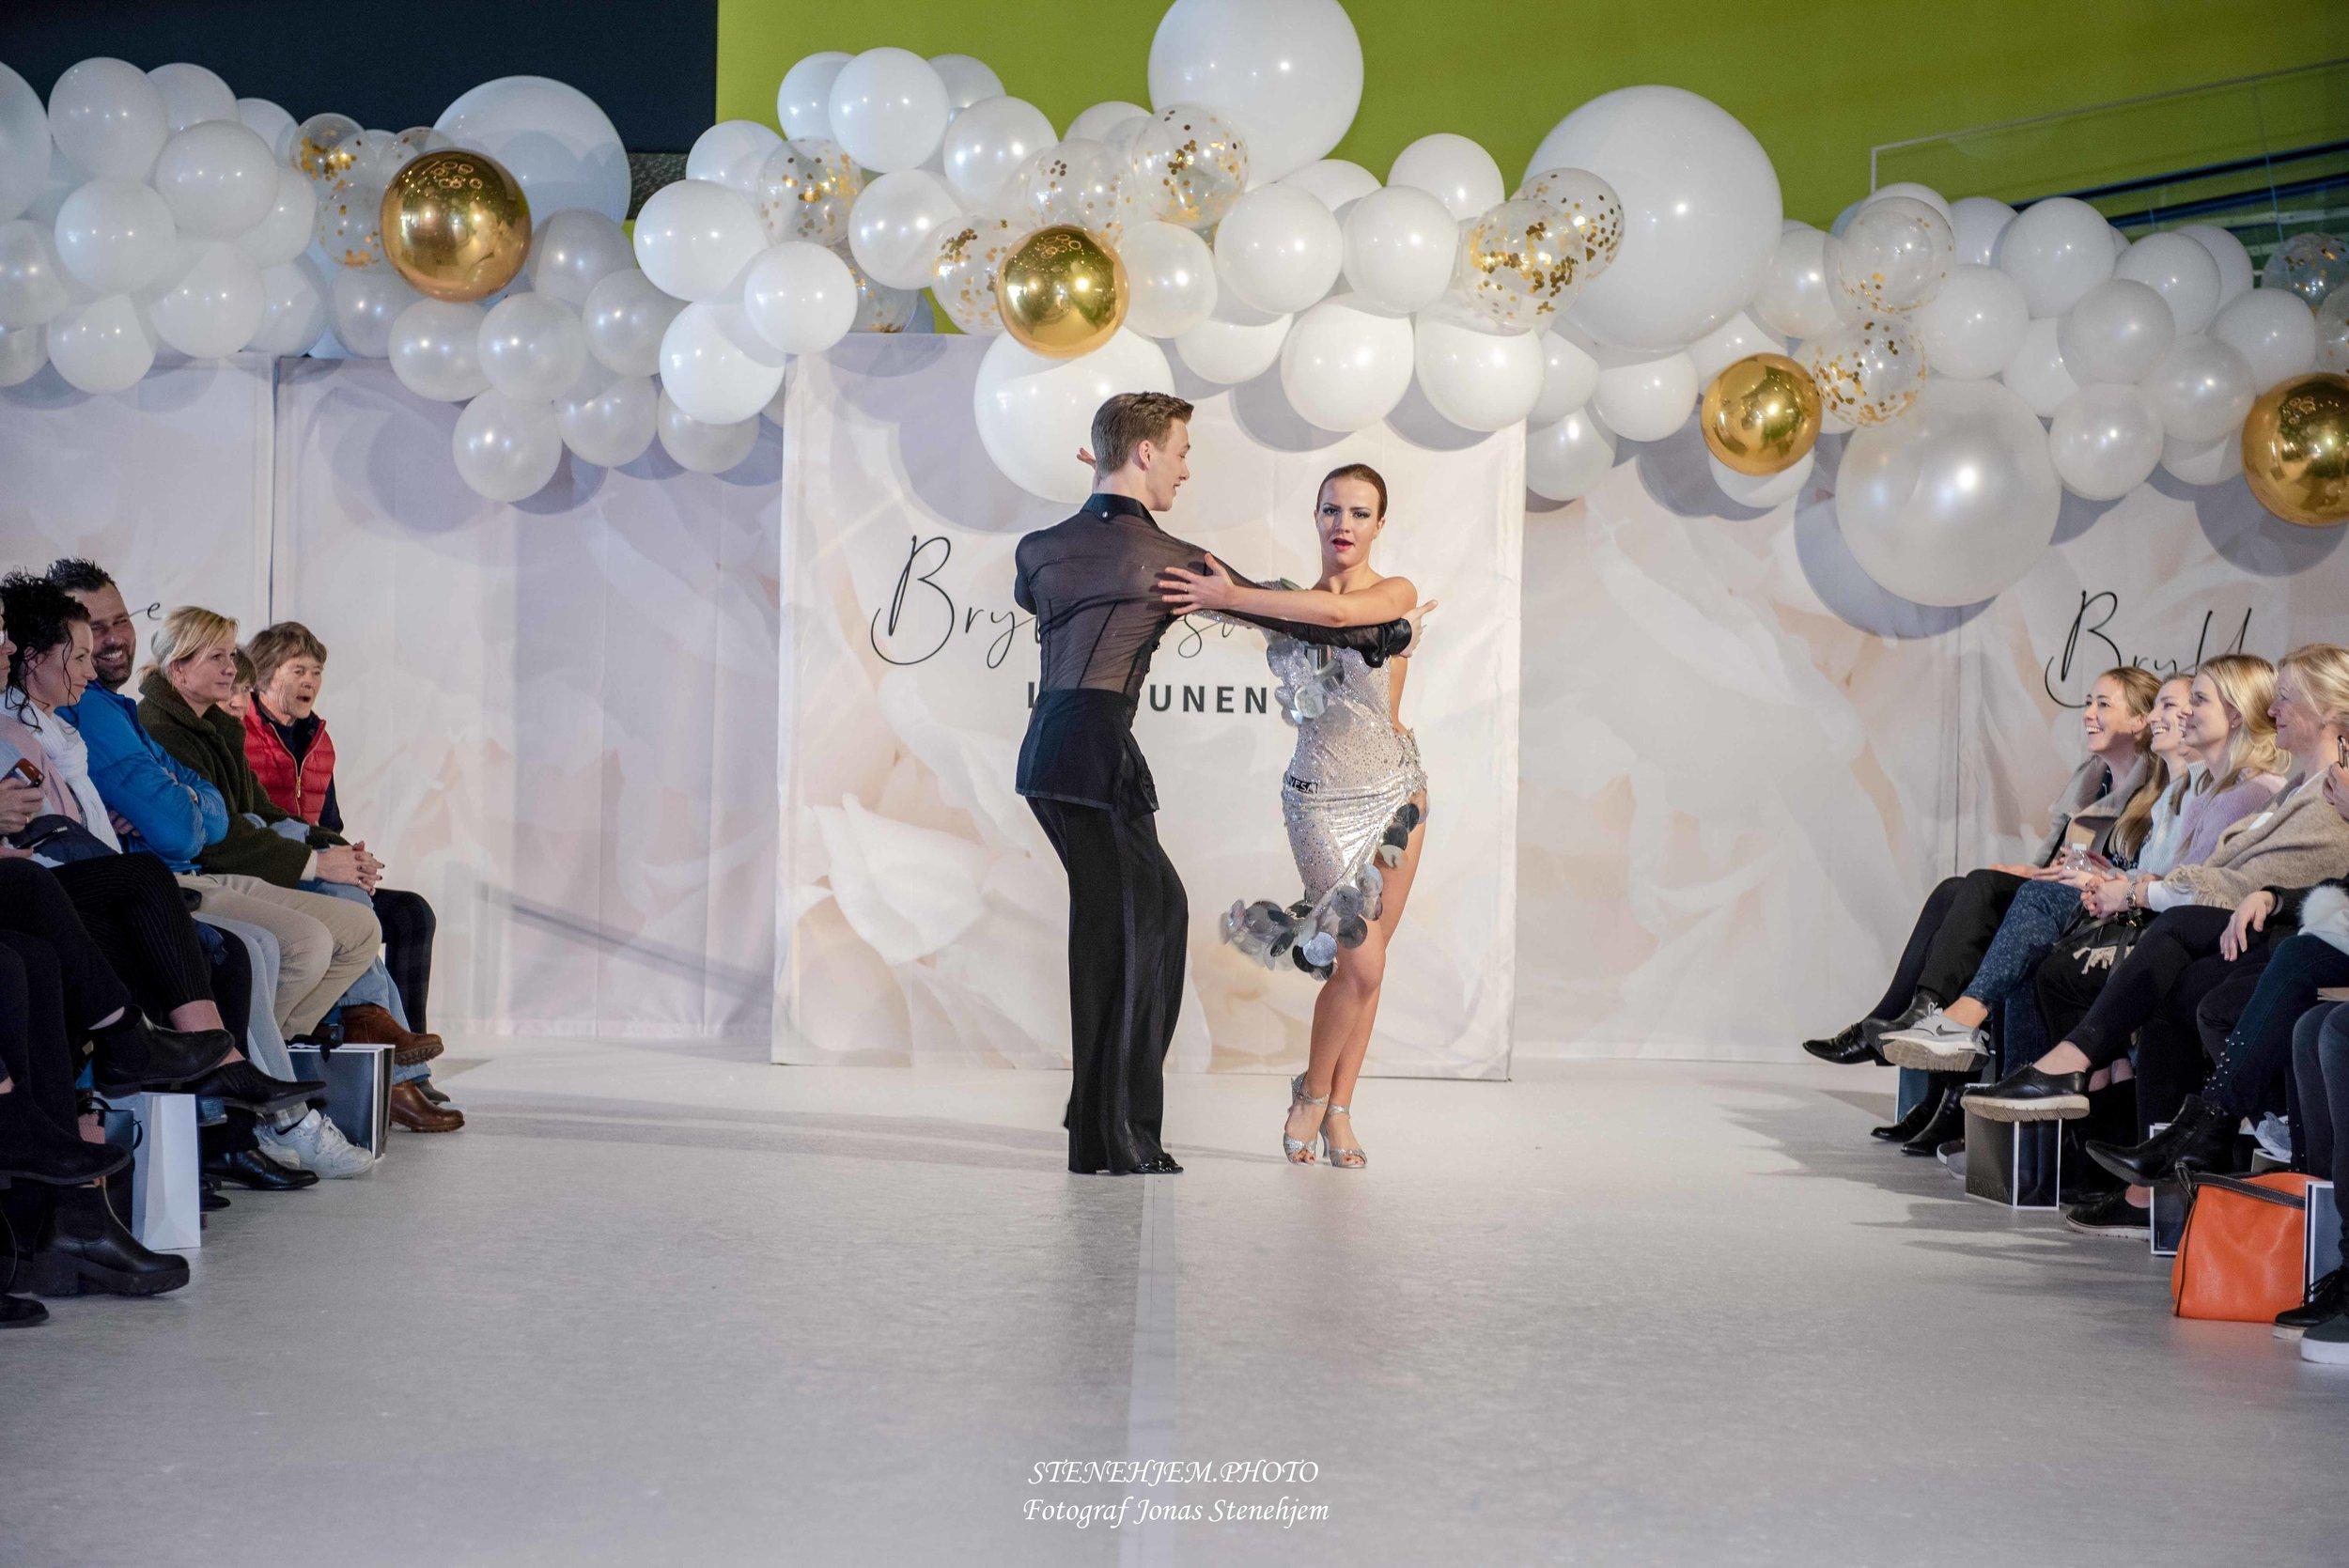 Bryllupsmesse_Lagunen_mittaltweddingfair__057.jpg